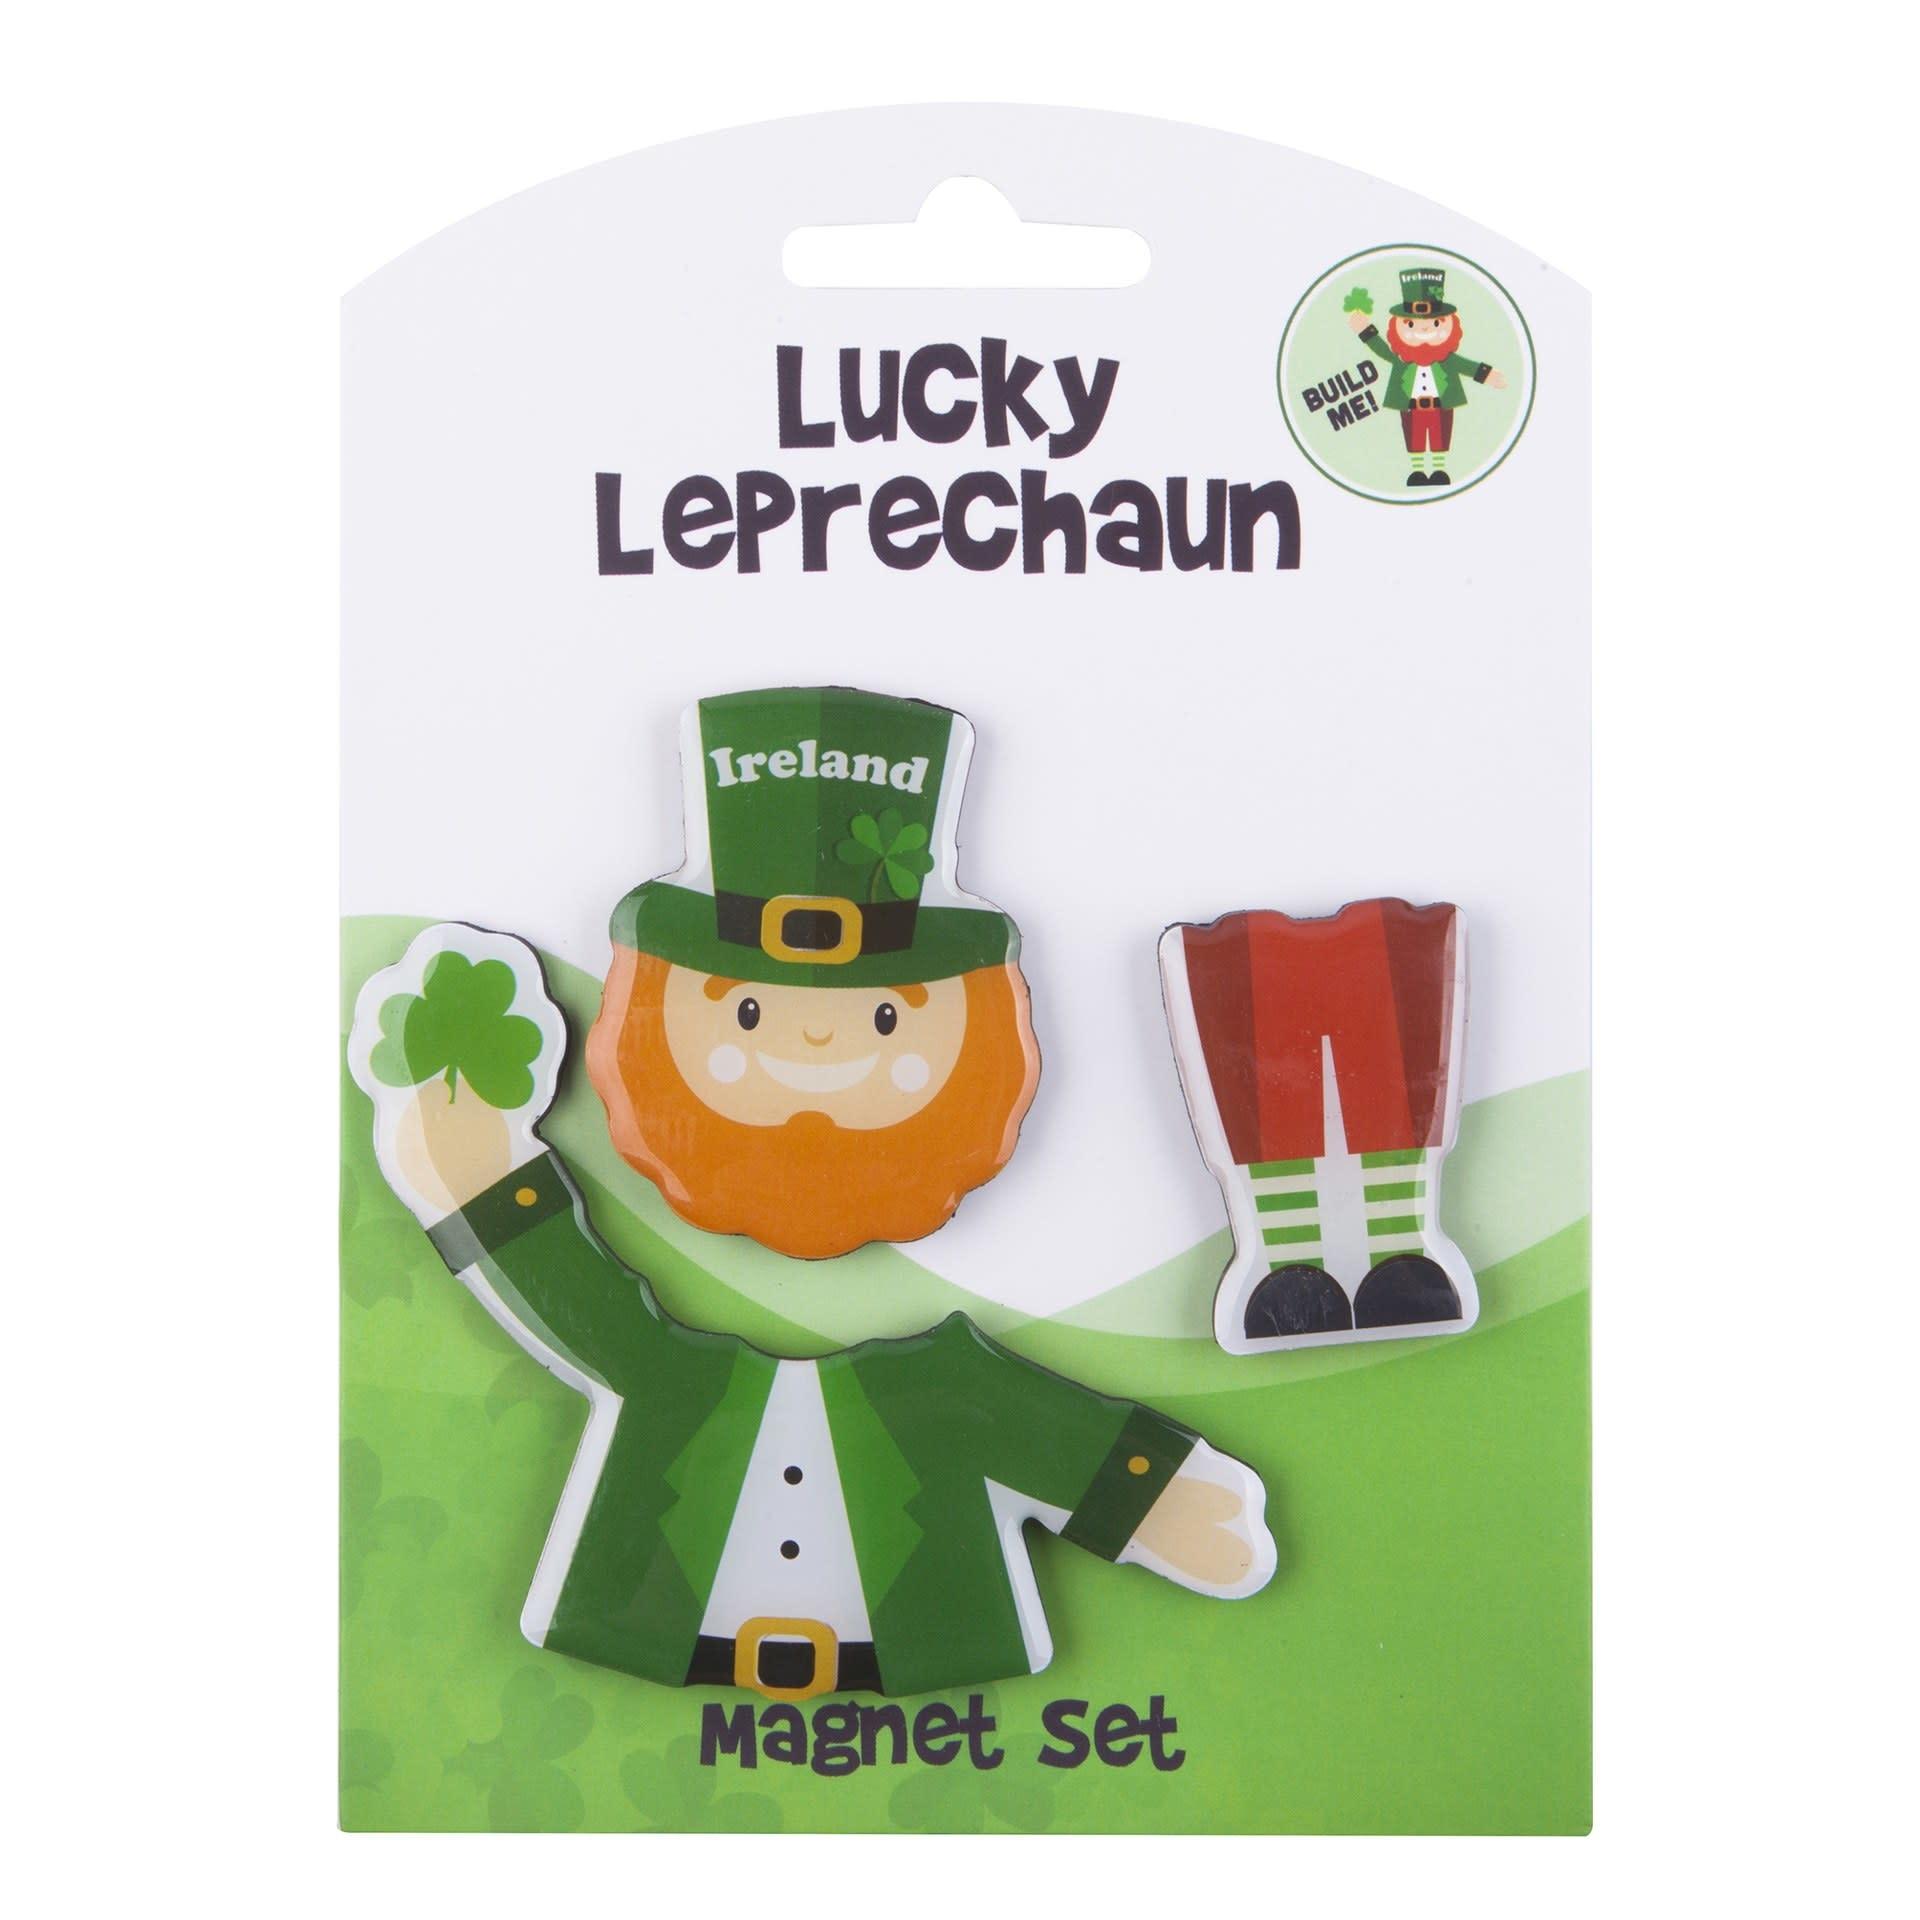 Magnet: Luck Lep